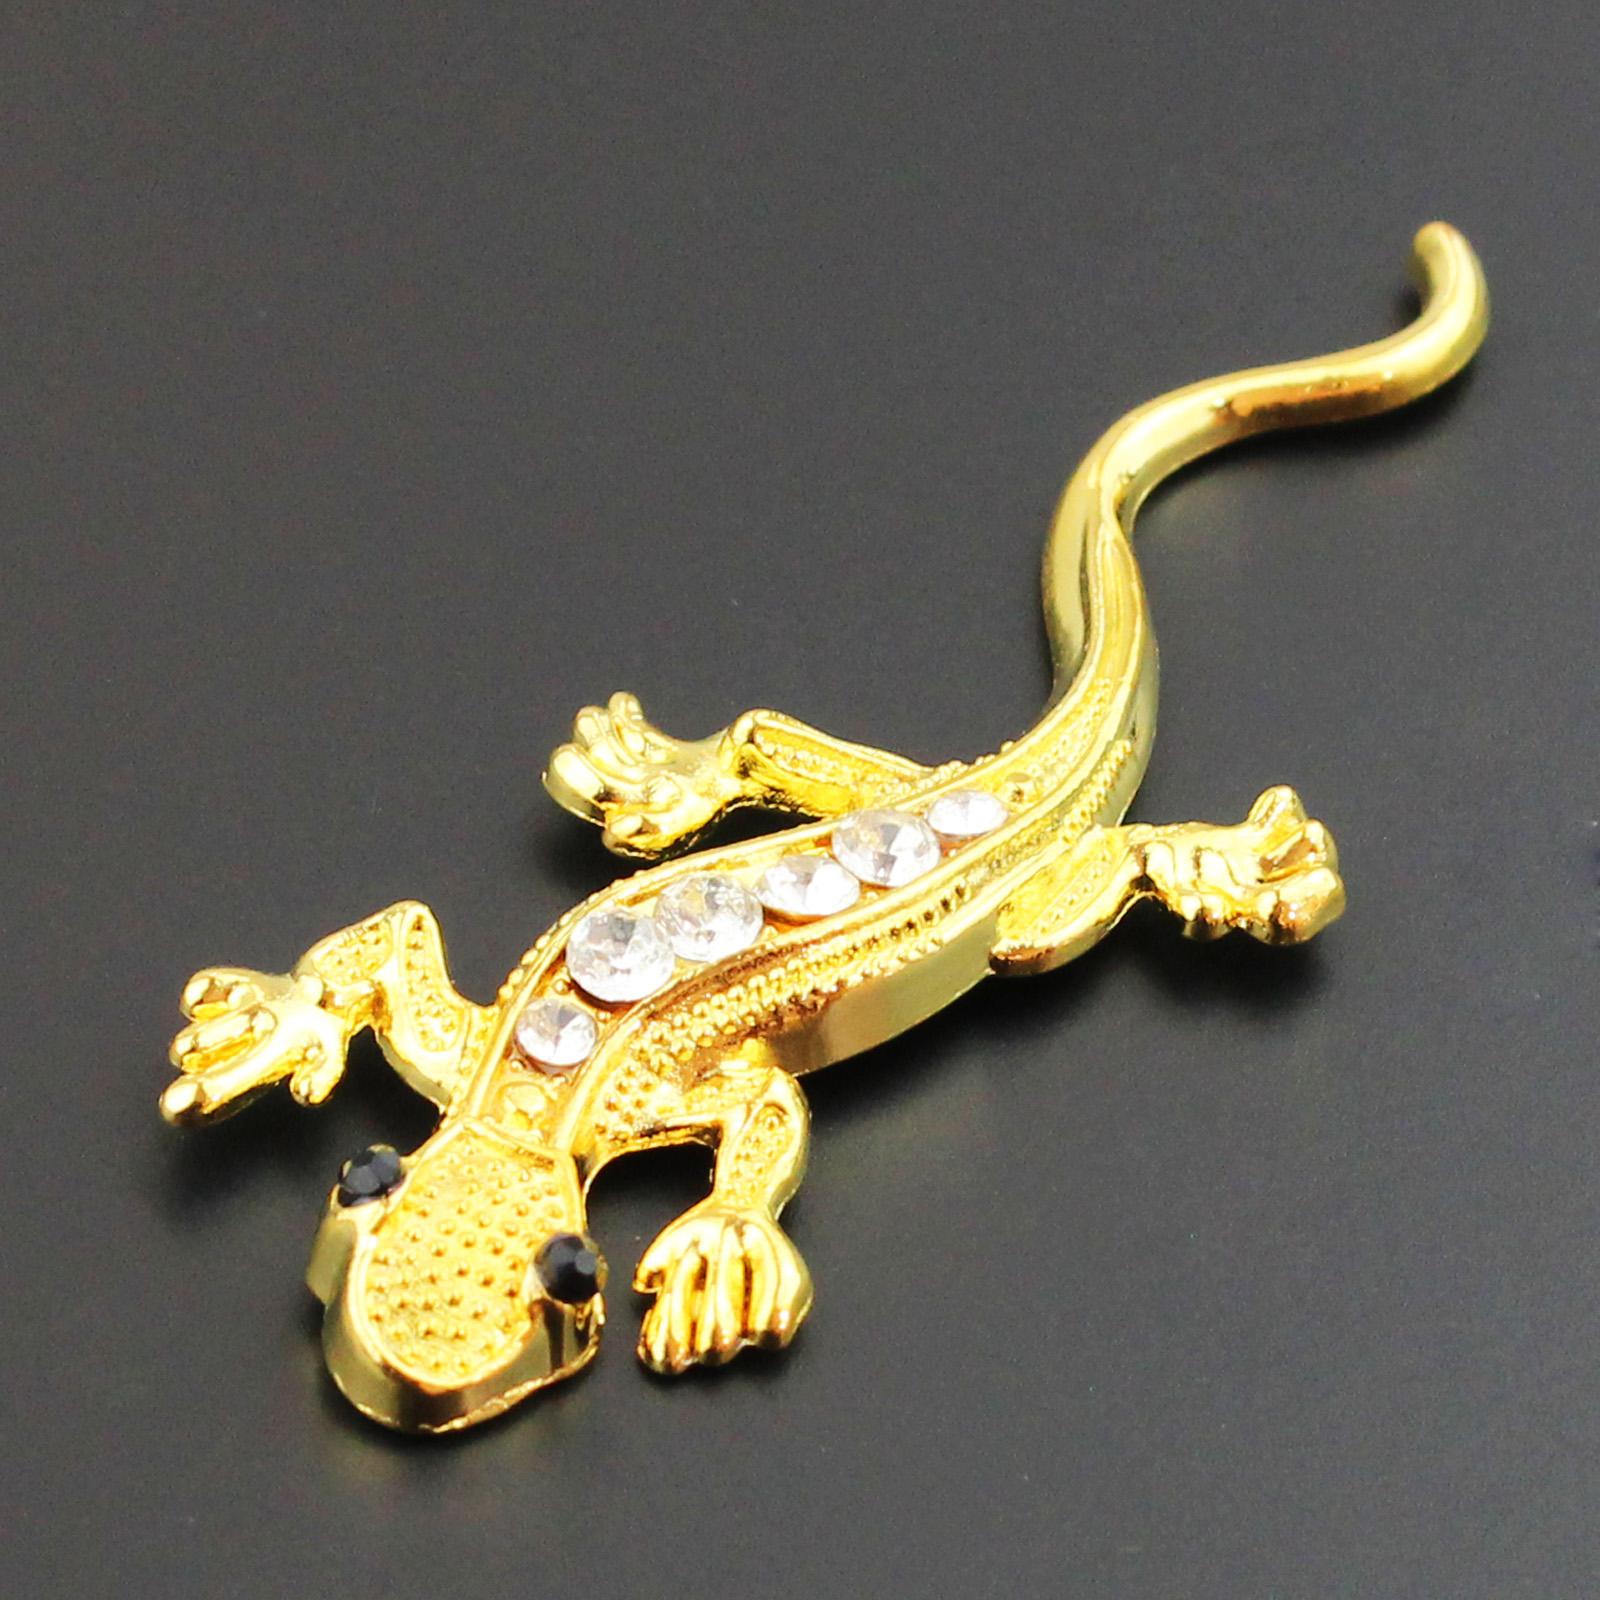 New Metal 3d Spider Gecko Turtle Dragon Emblem Decal